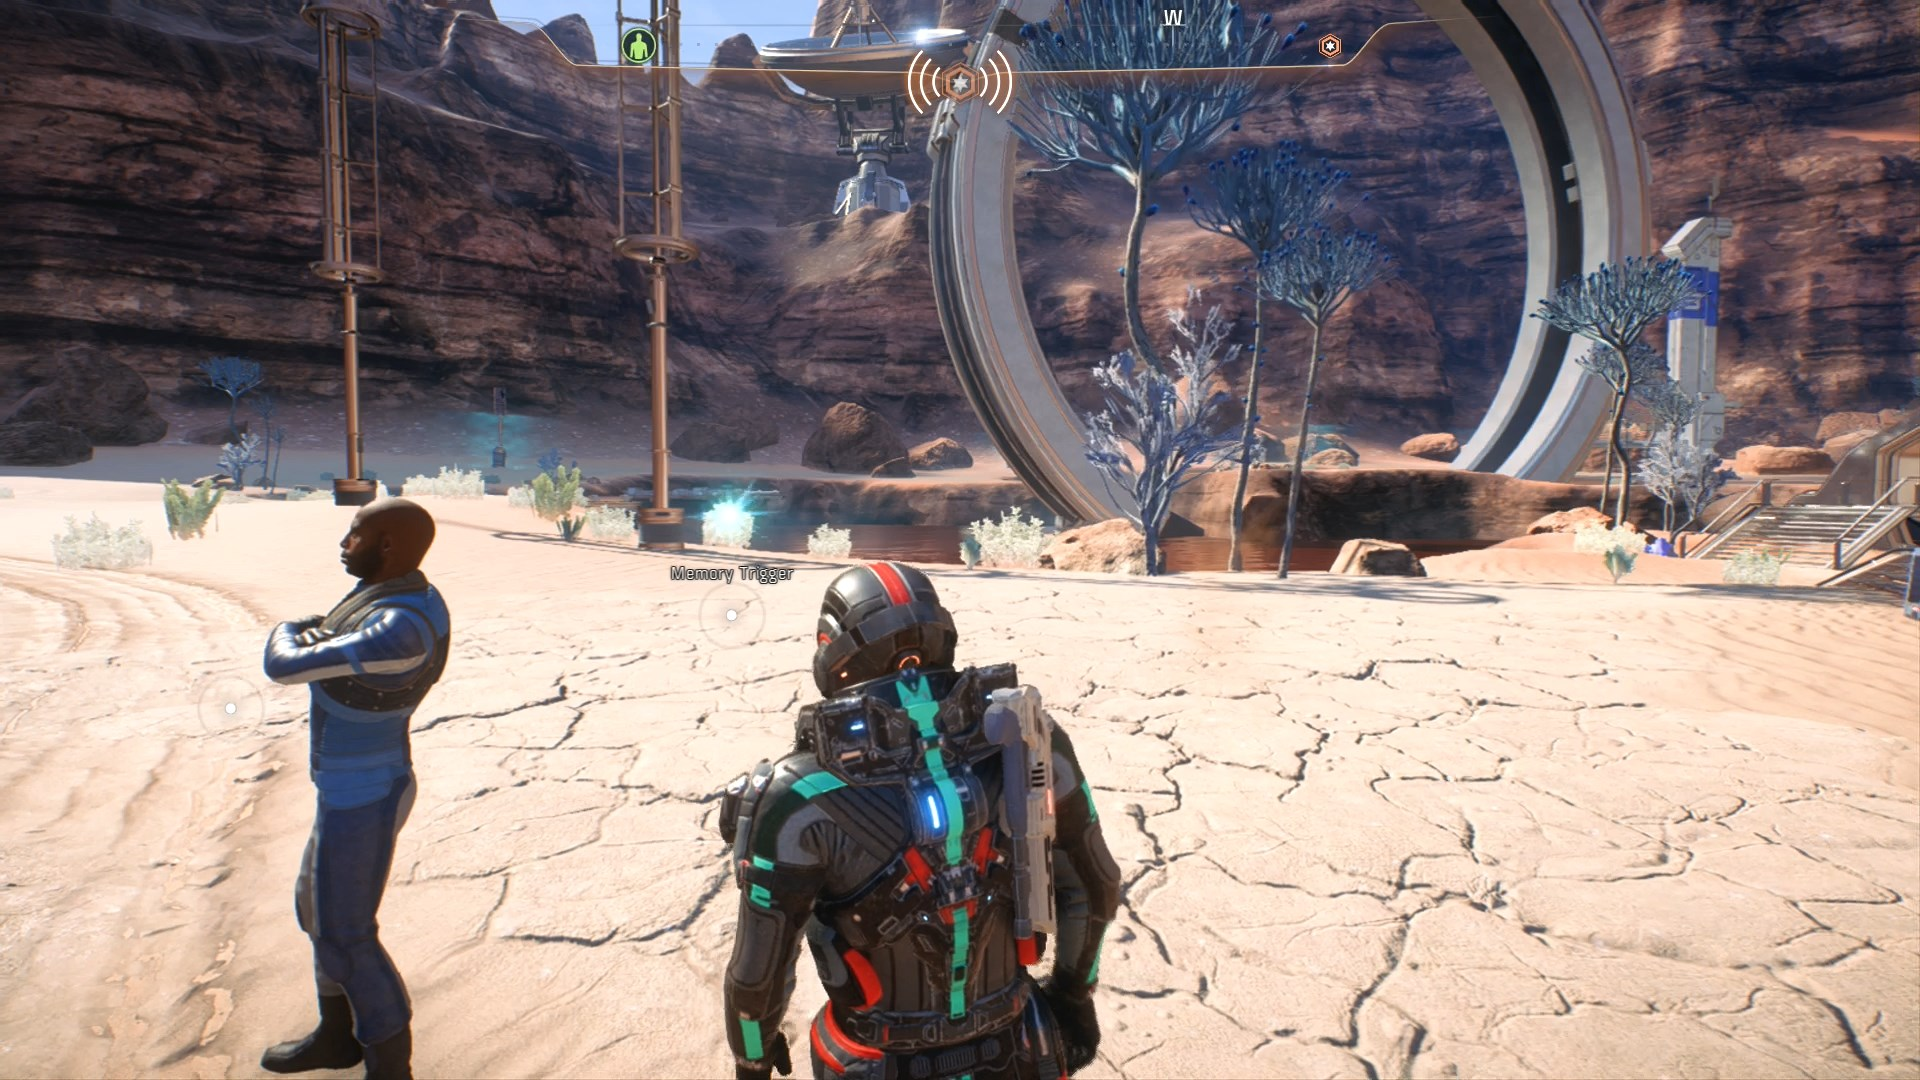 Mass Effect Andromeda Eos Memory Trigger 2